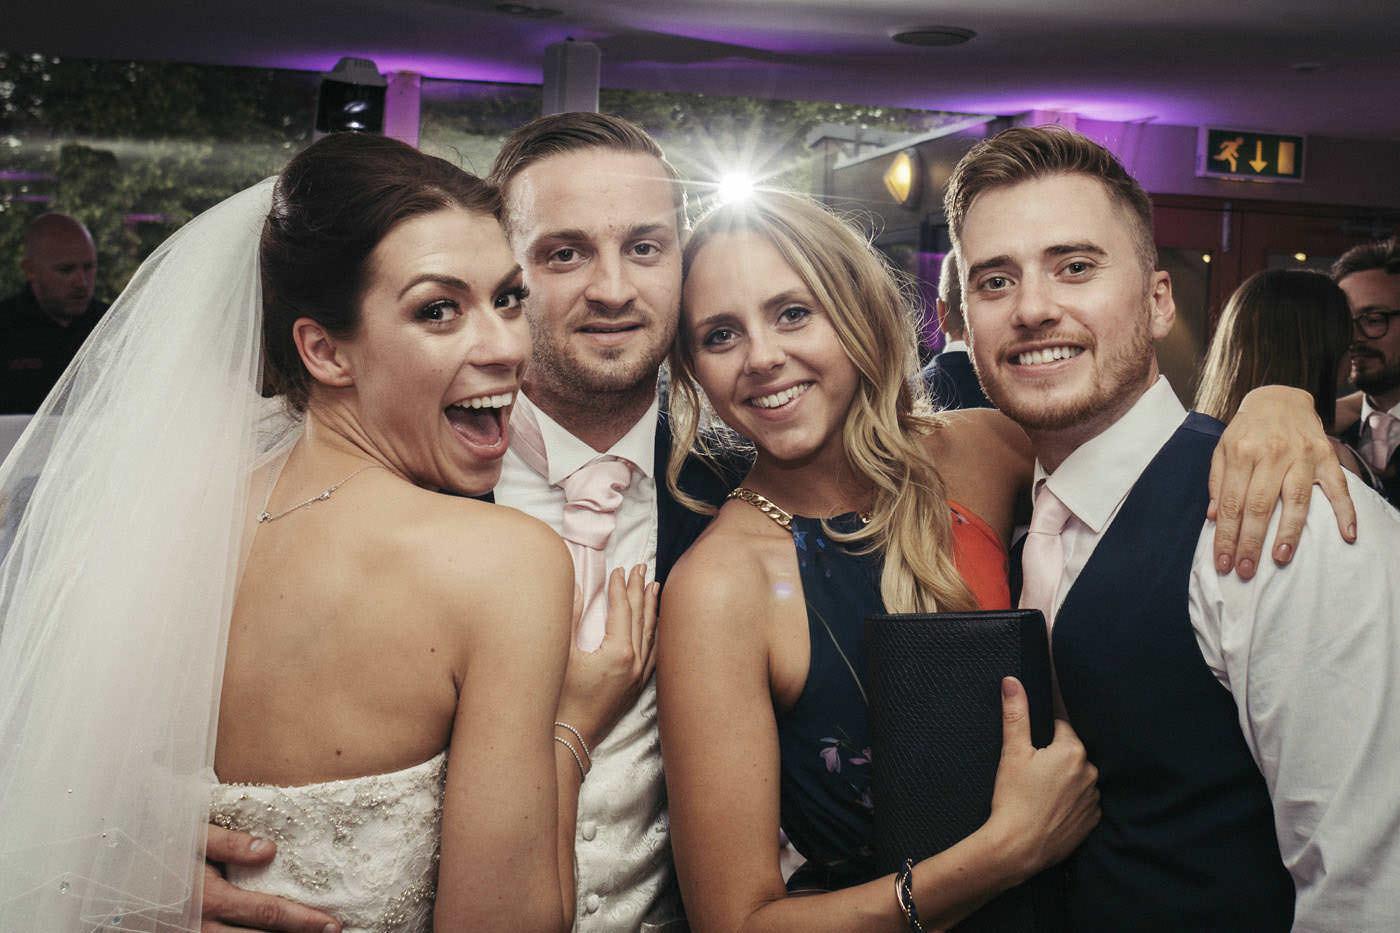 lukeemily foxhills wedding photographer 0161